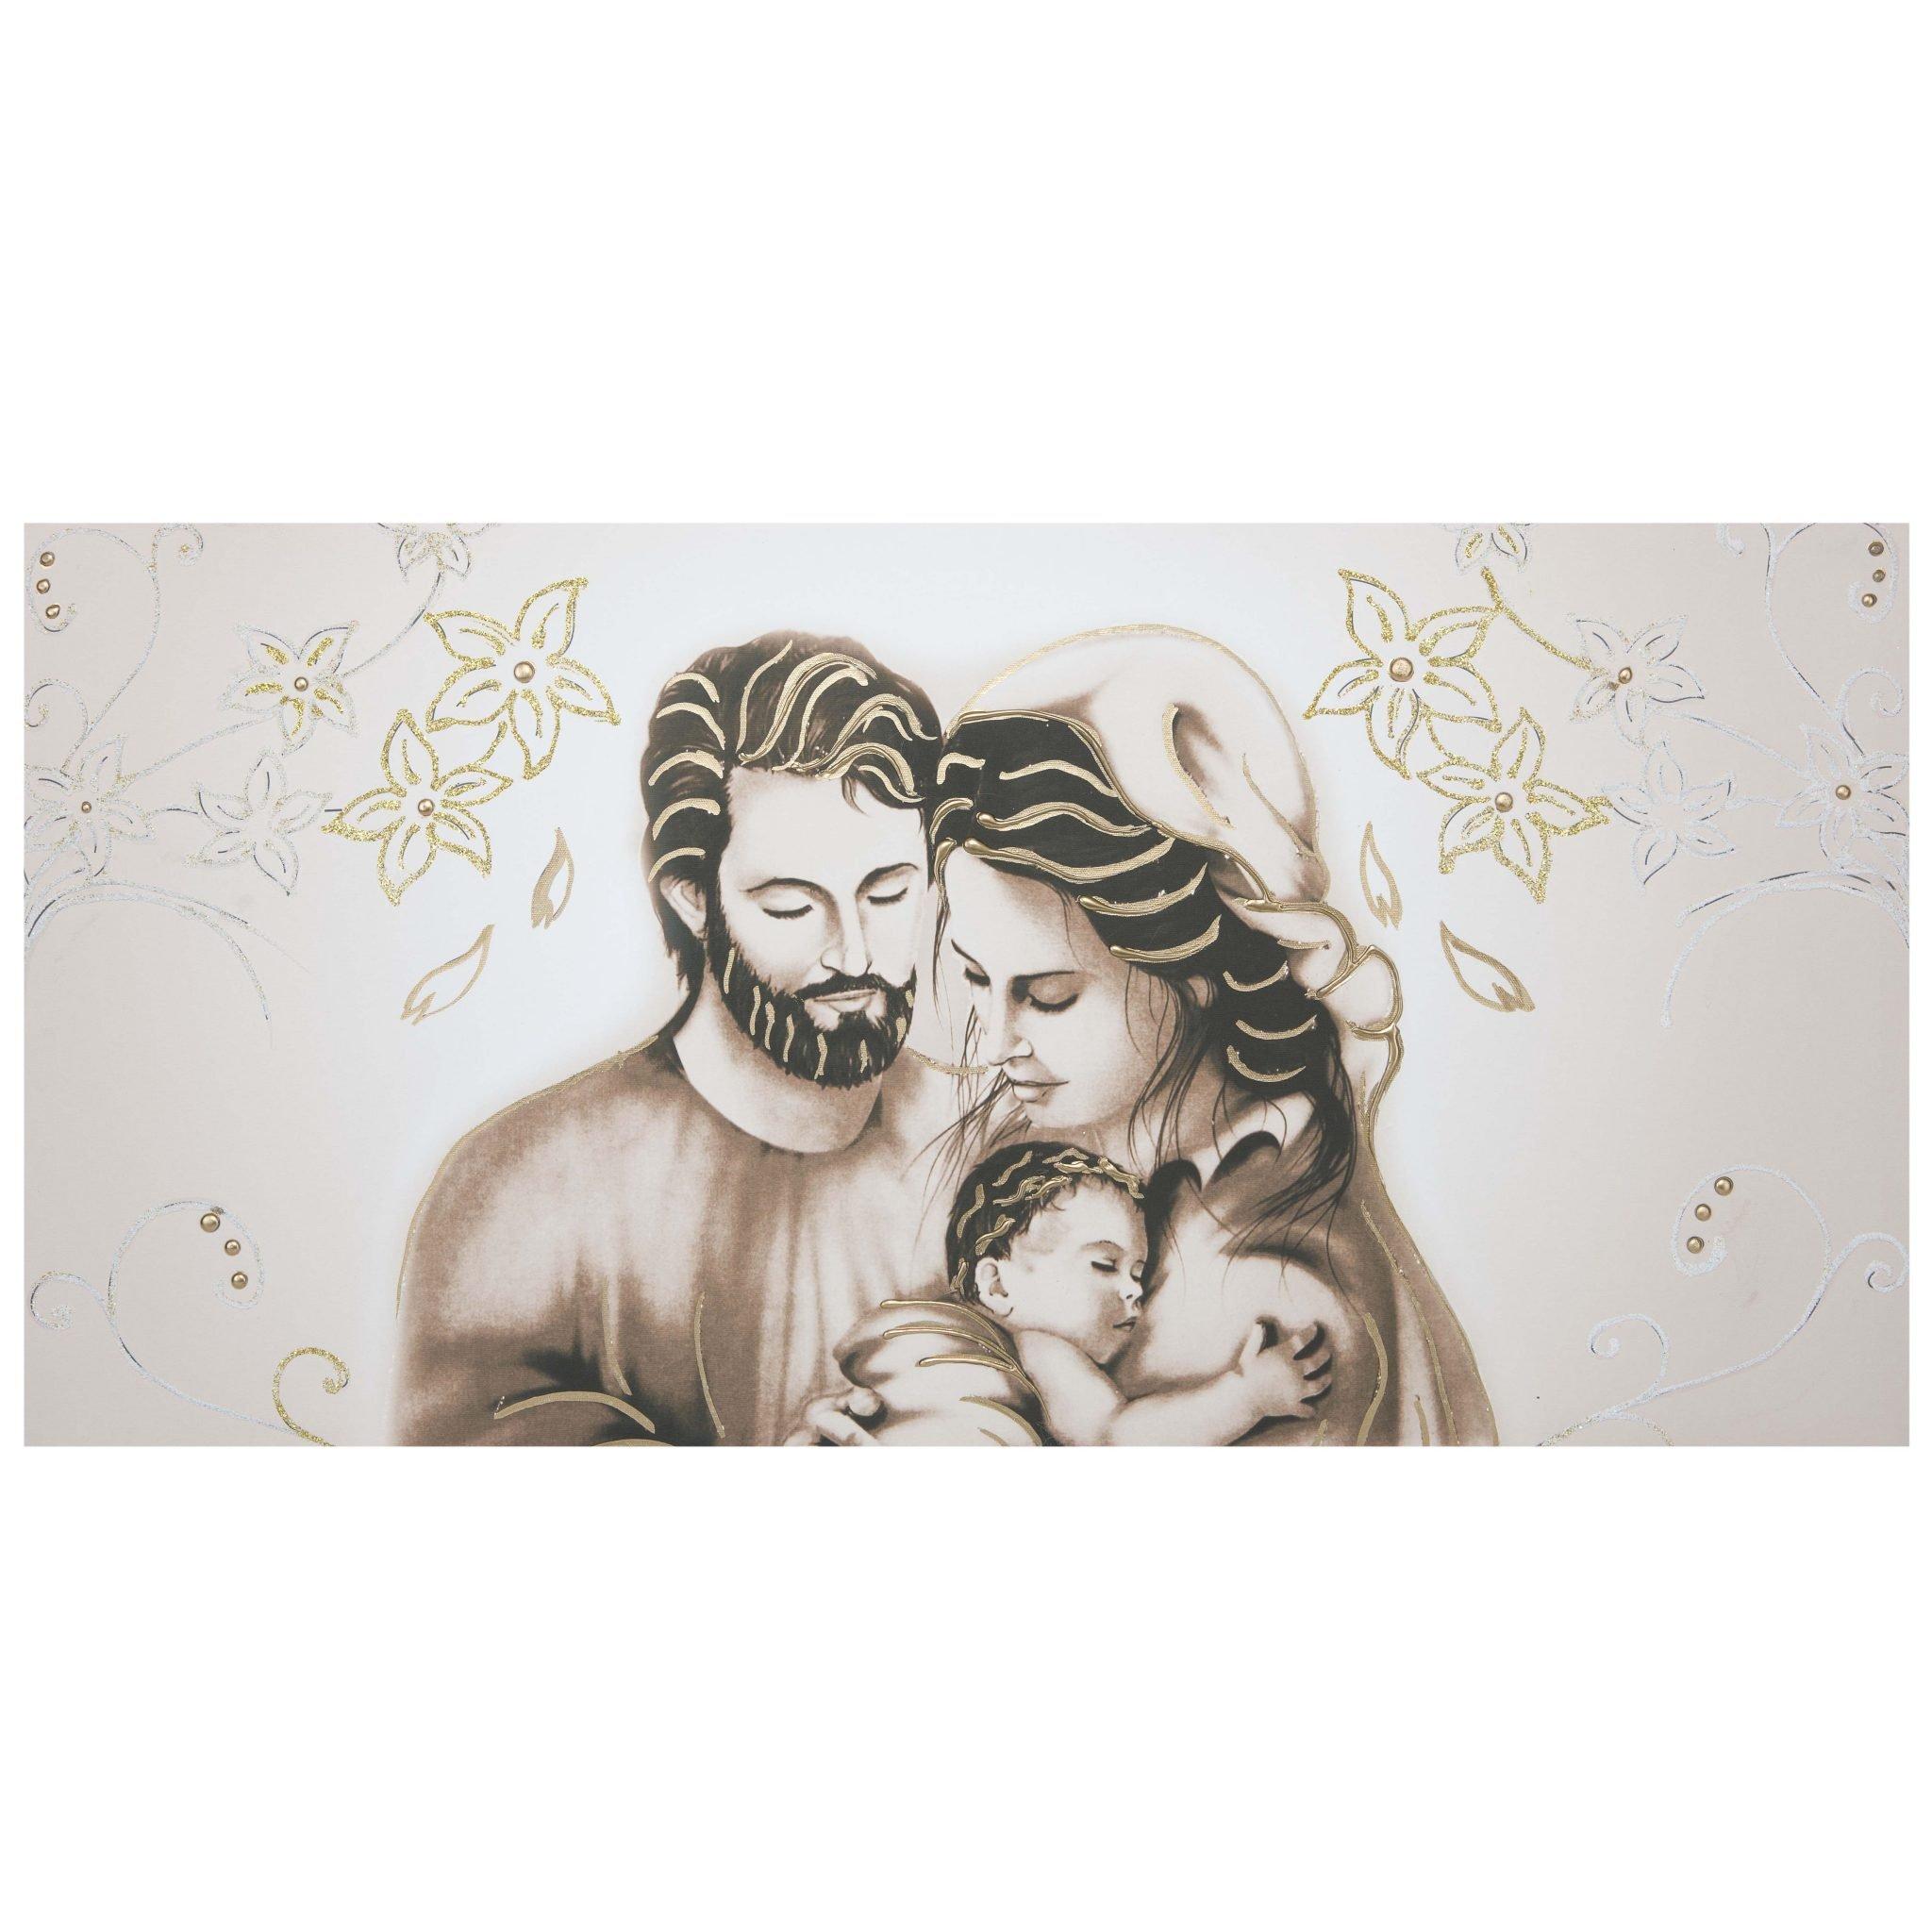 Quadro capezzale tela d 39 arredo sacra famiglia foglie oro for Quadri sacra famiglia moderni prezzi